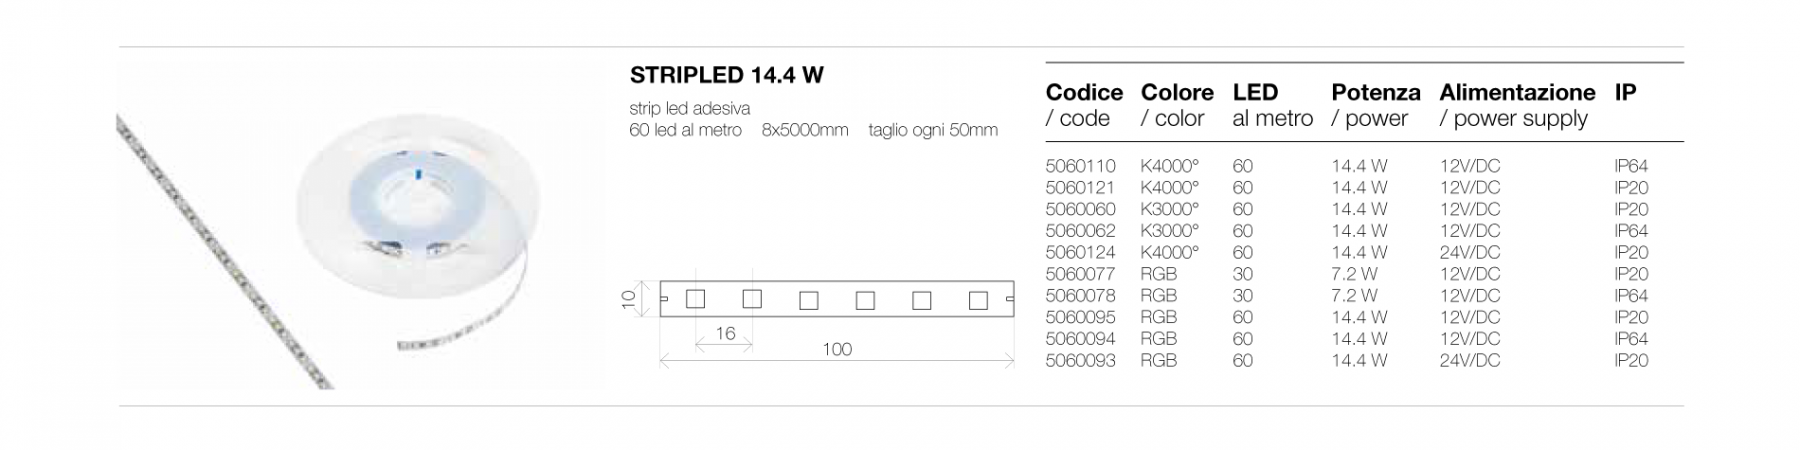 STRIP LED 14.4 W